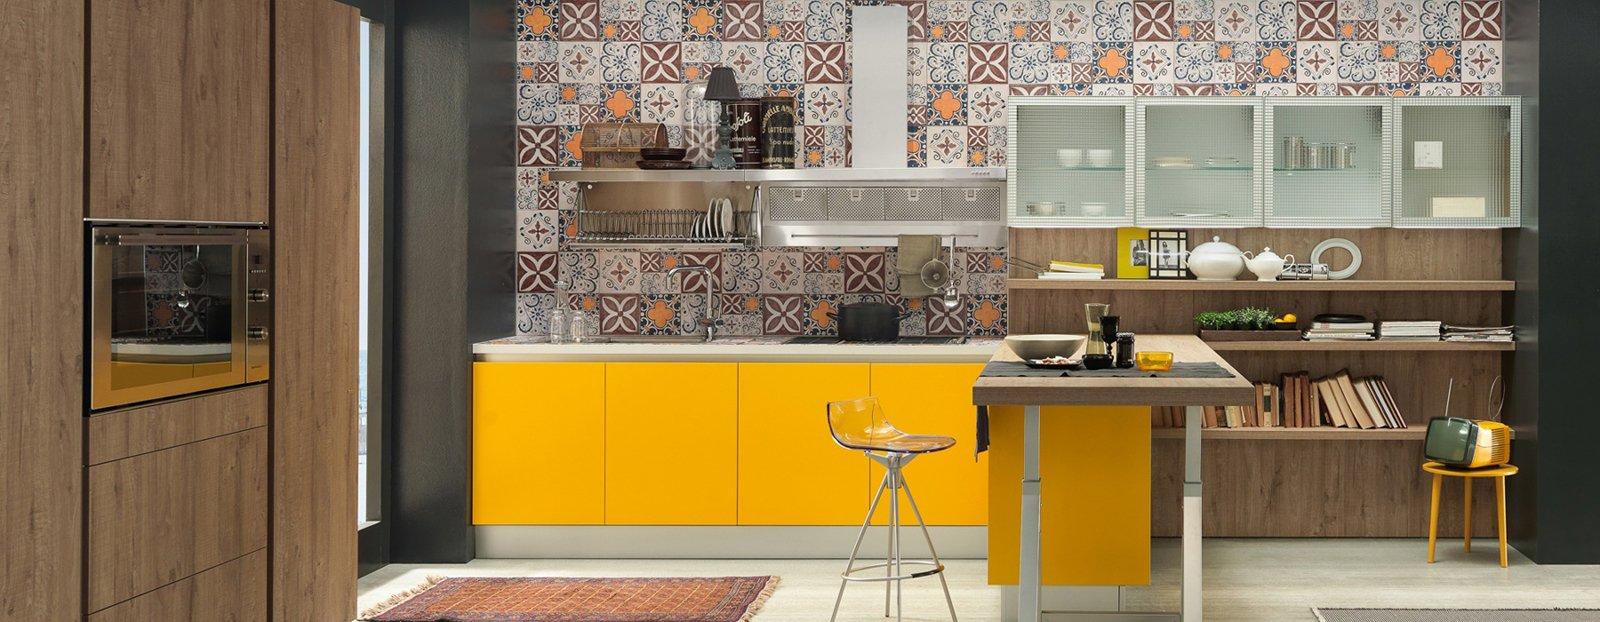 Industrial style a eurocucina 2014 cose di casa - Piastrelle in maiolica ...